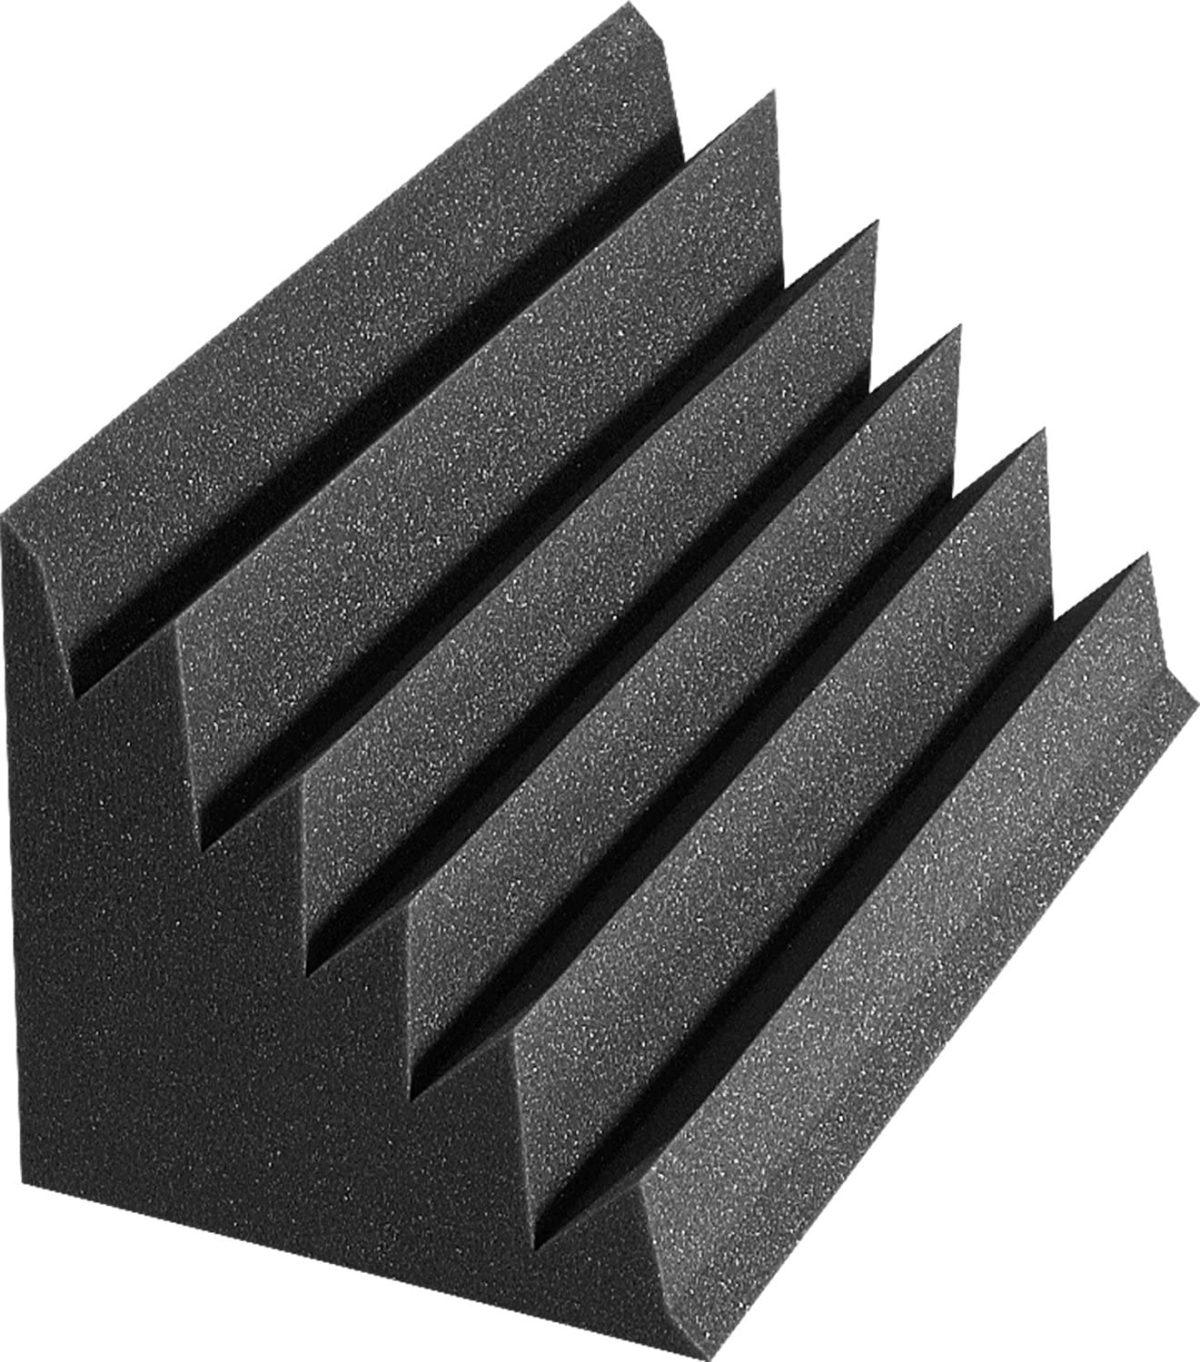 Auralex Acoustics Bass Trap - Sound Reducing Panels